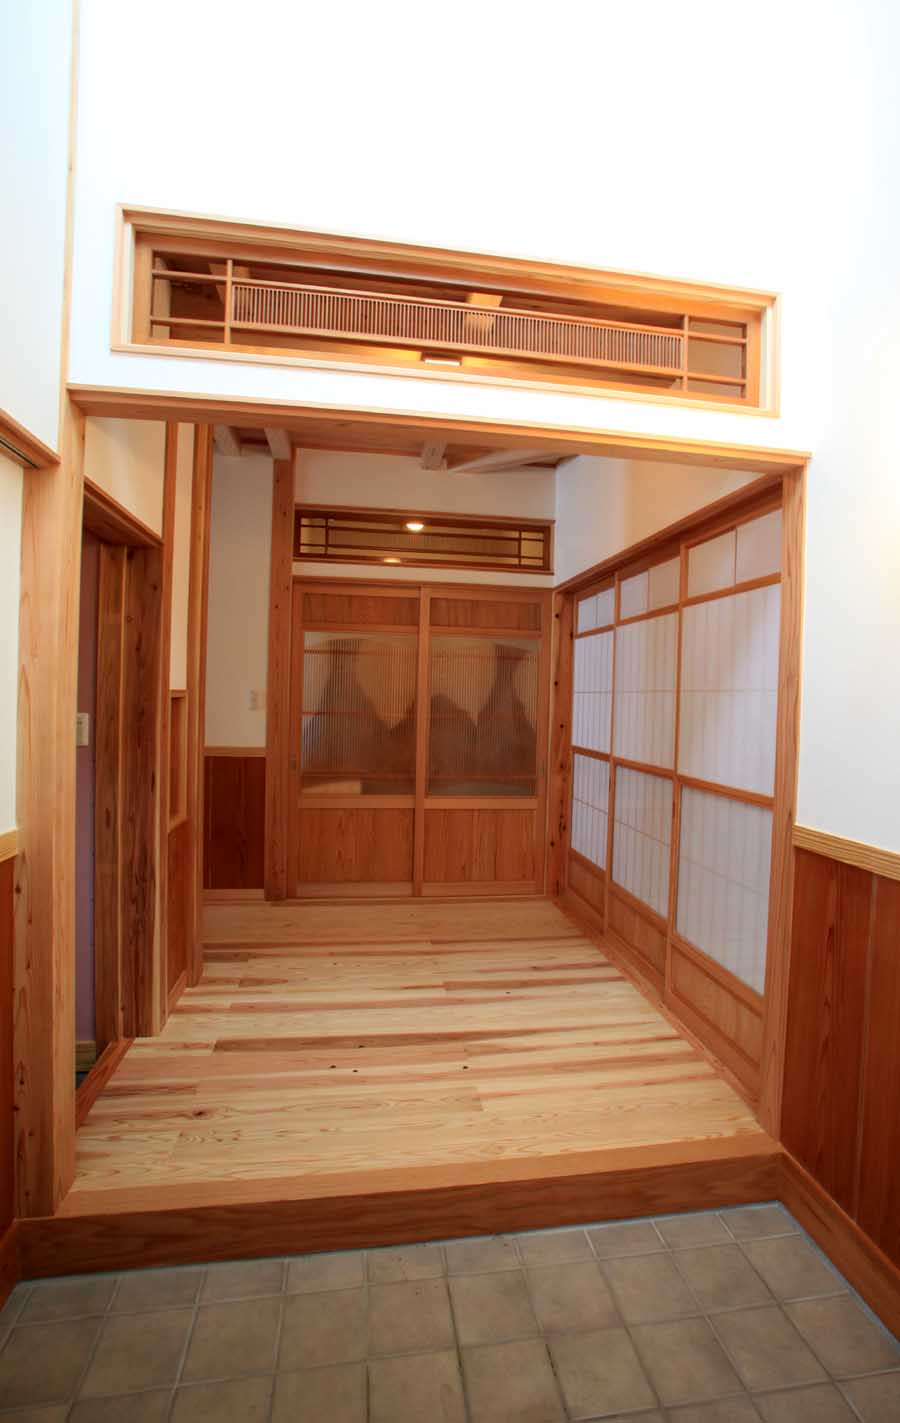 M様邸「三木田の家」 御礼_f0150893_16125432.jpg